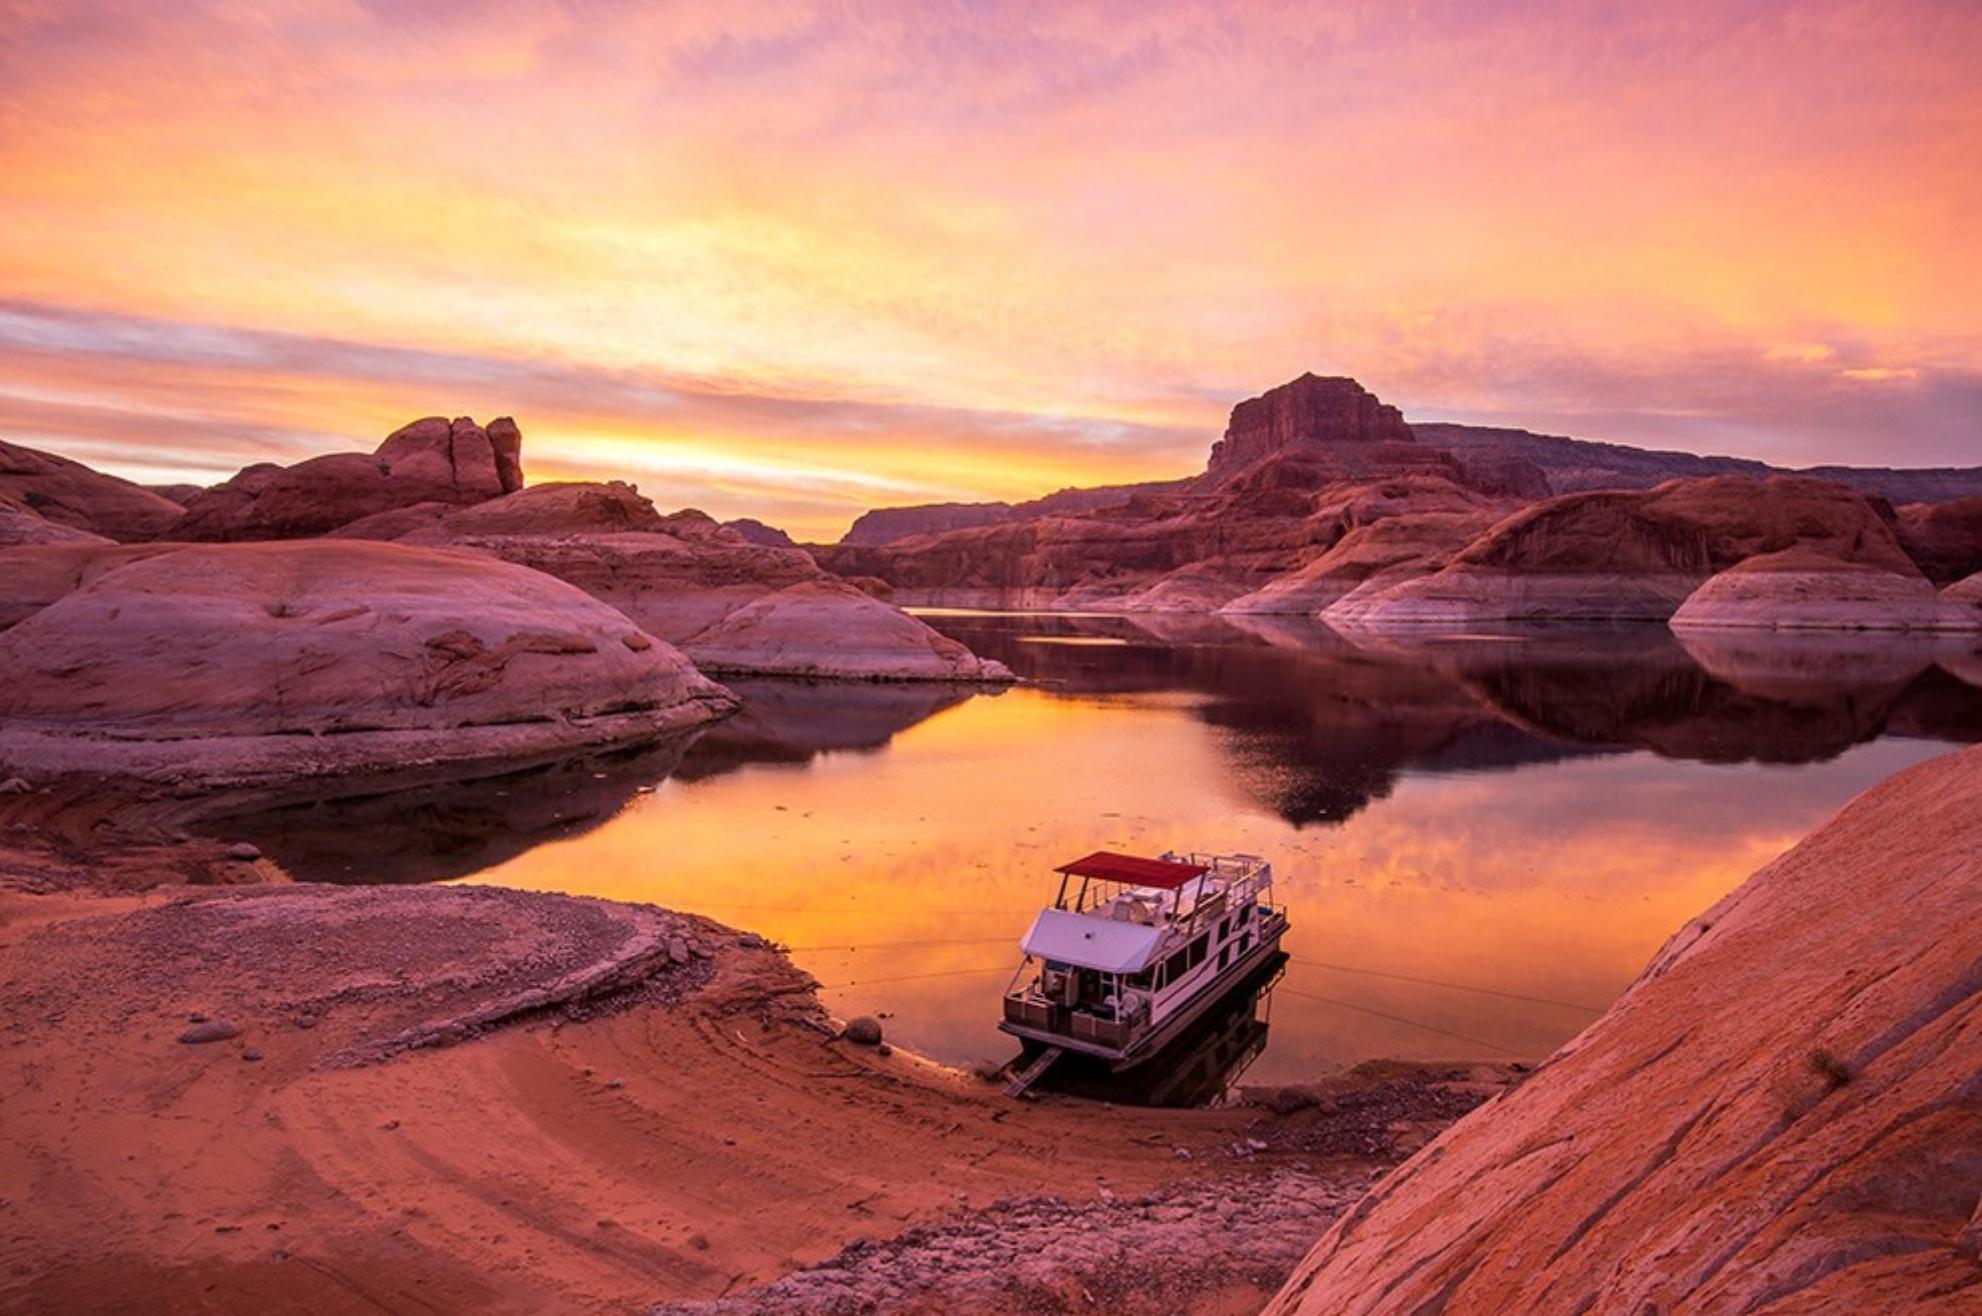 2/Lake Powell, Arizona-Utah